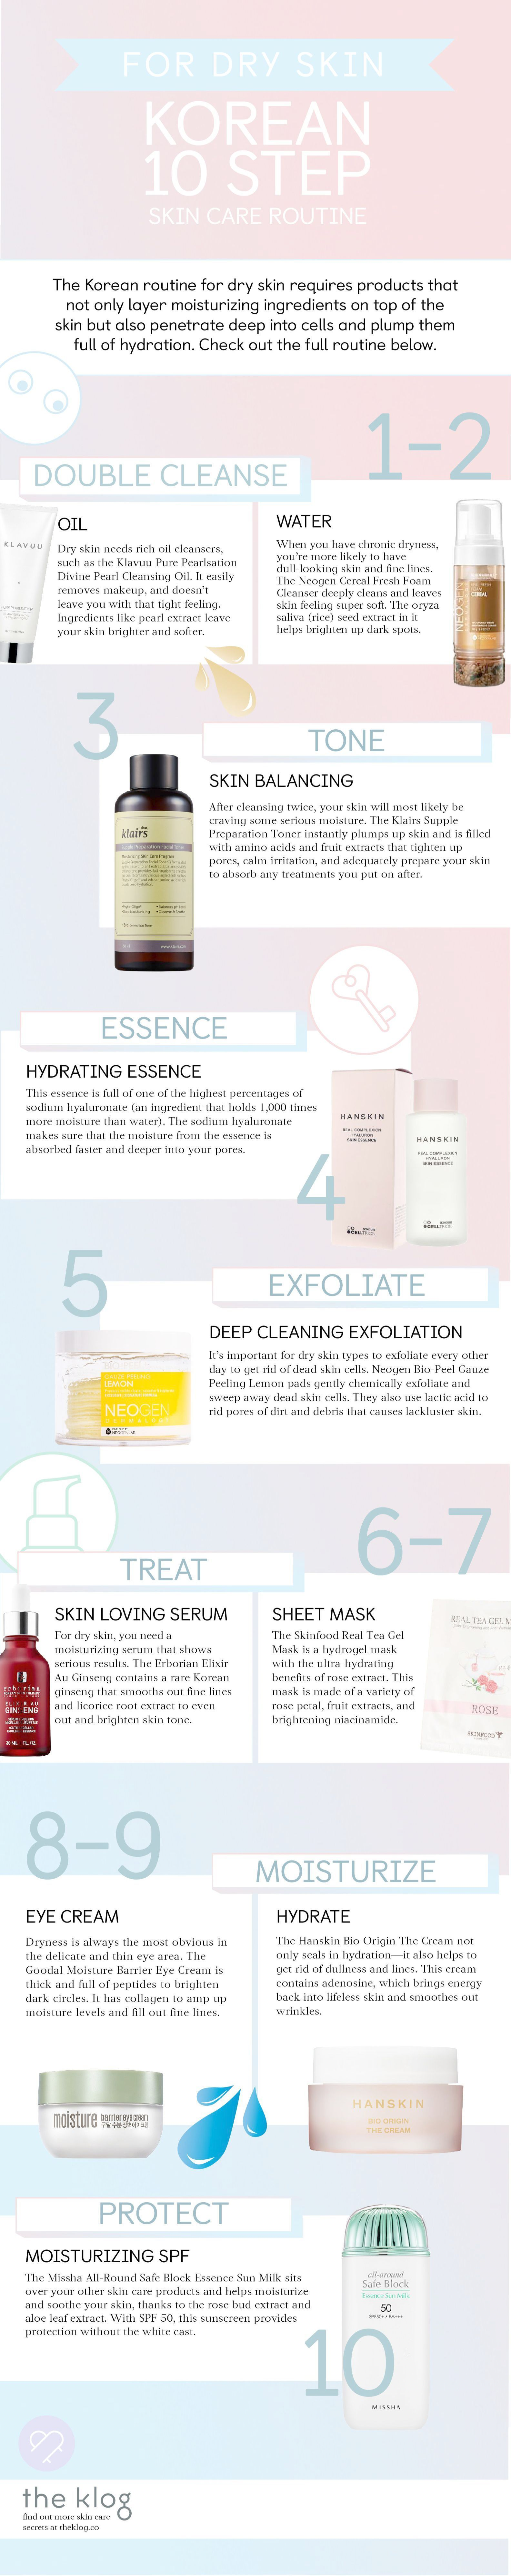 Skincareaddiction Skincare Benefits Skincare Provided Skincare Routine Rosacea Fridge Night Dry Skin Routine Skin Essence Natural Skin Care Routine